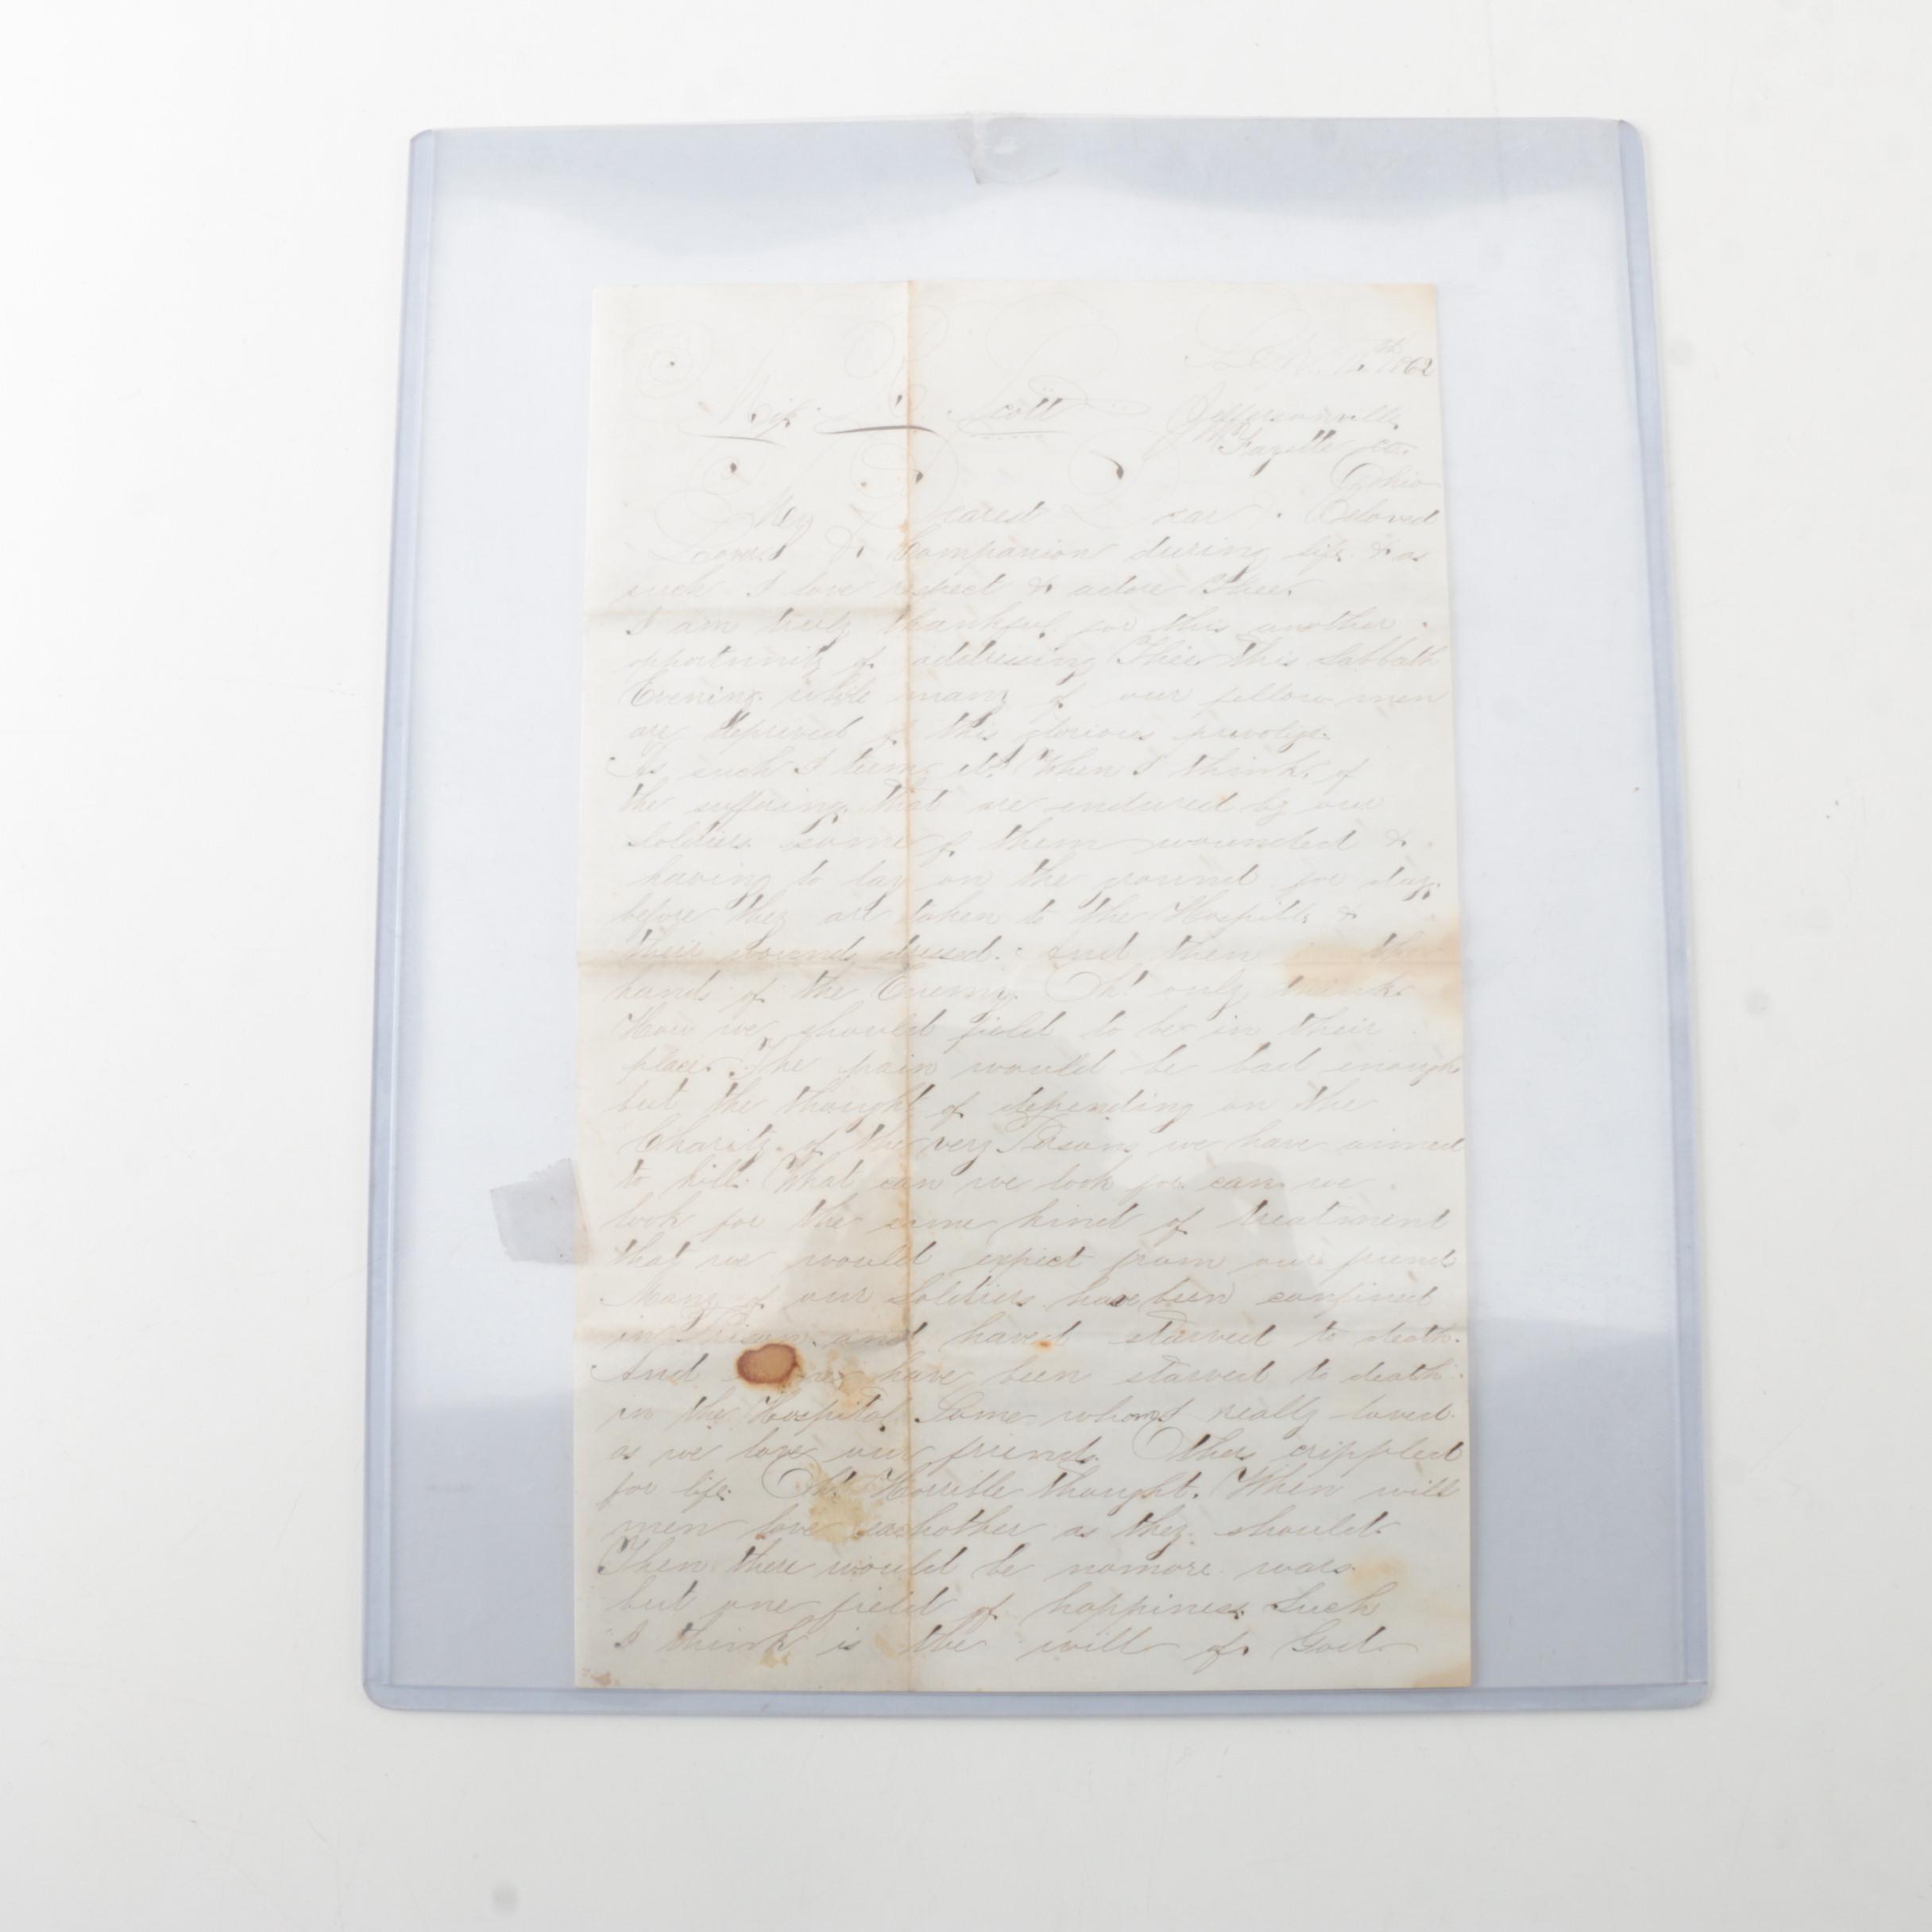 1862 Handwritten Letter